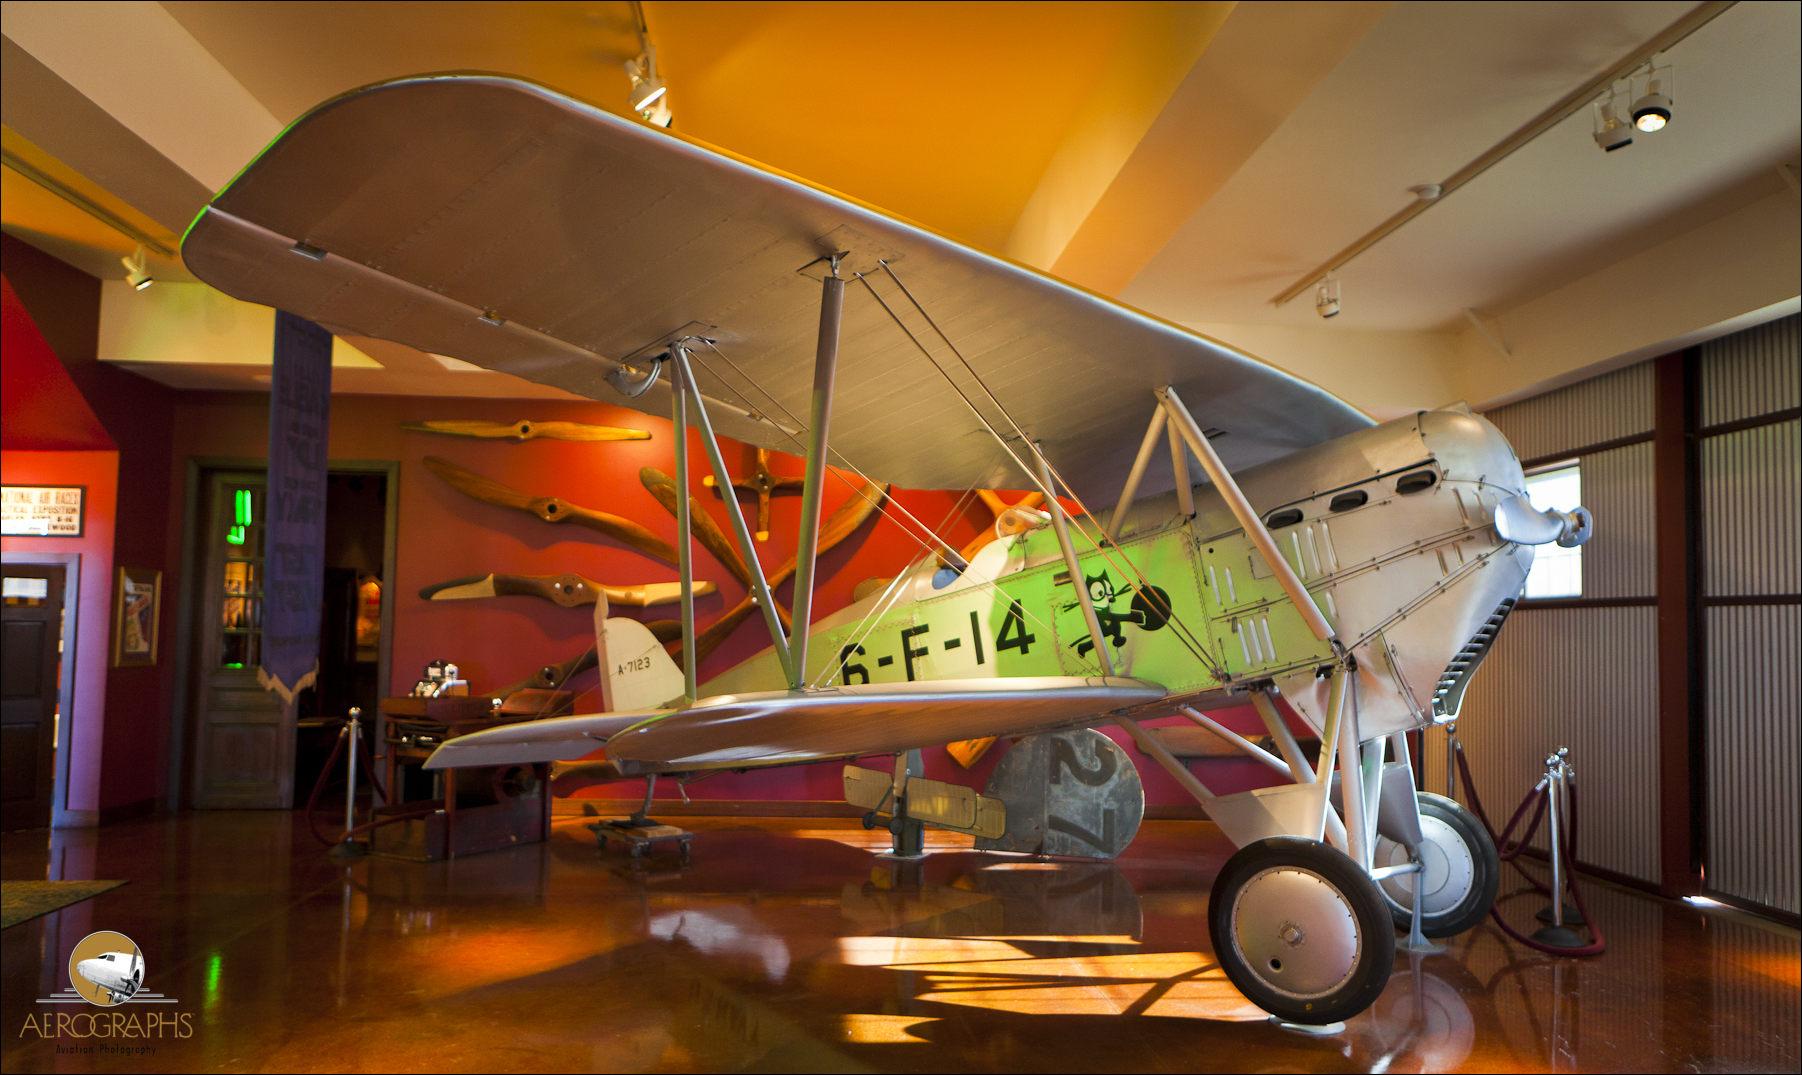 Vintage aircraft on display at the Allen Airways Flying Museum in El Cajon, California.